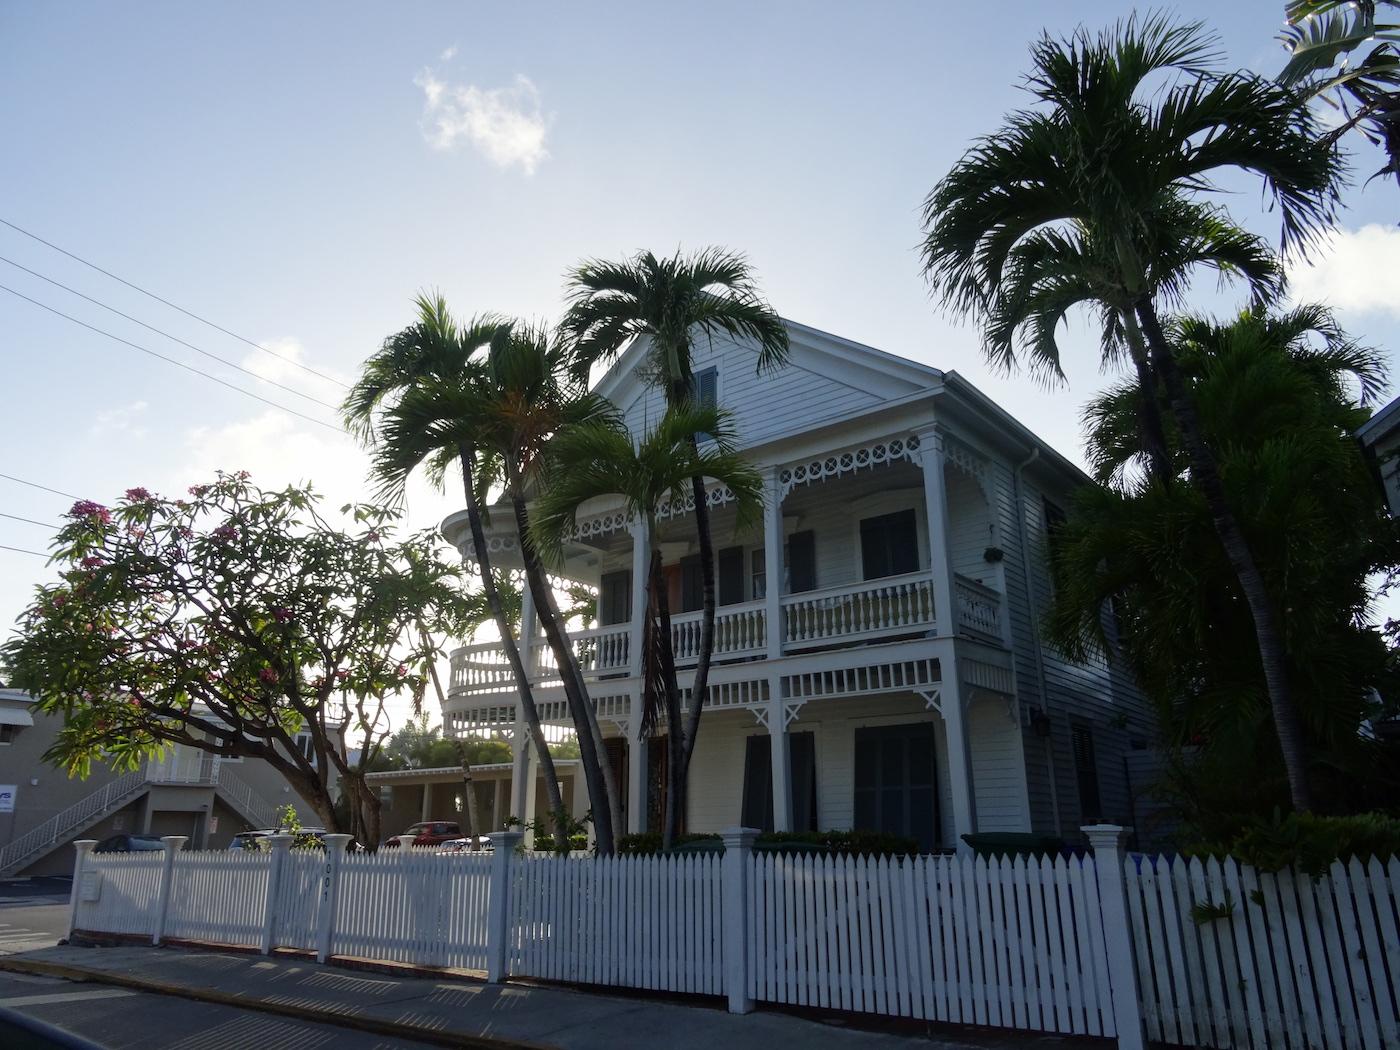 Key West petite maison